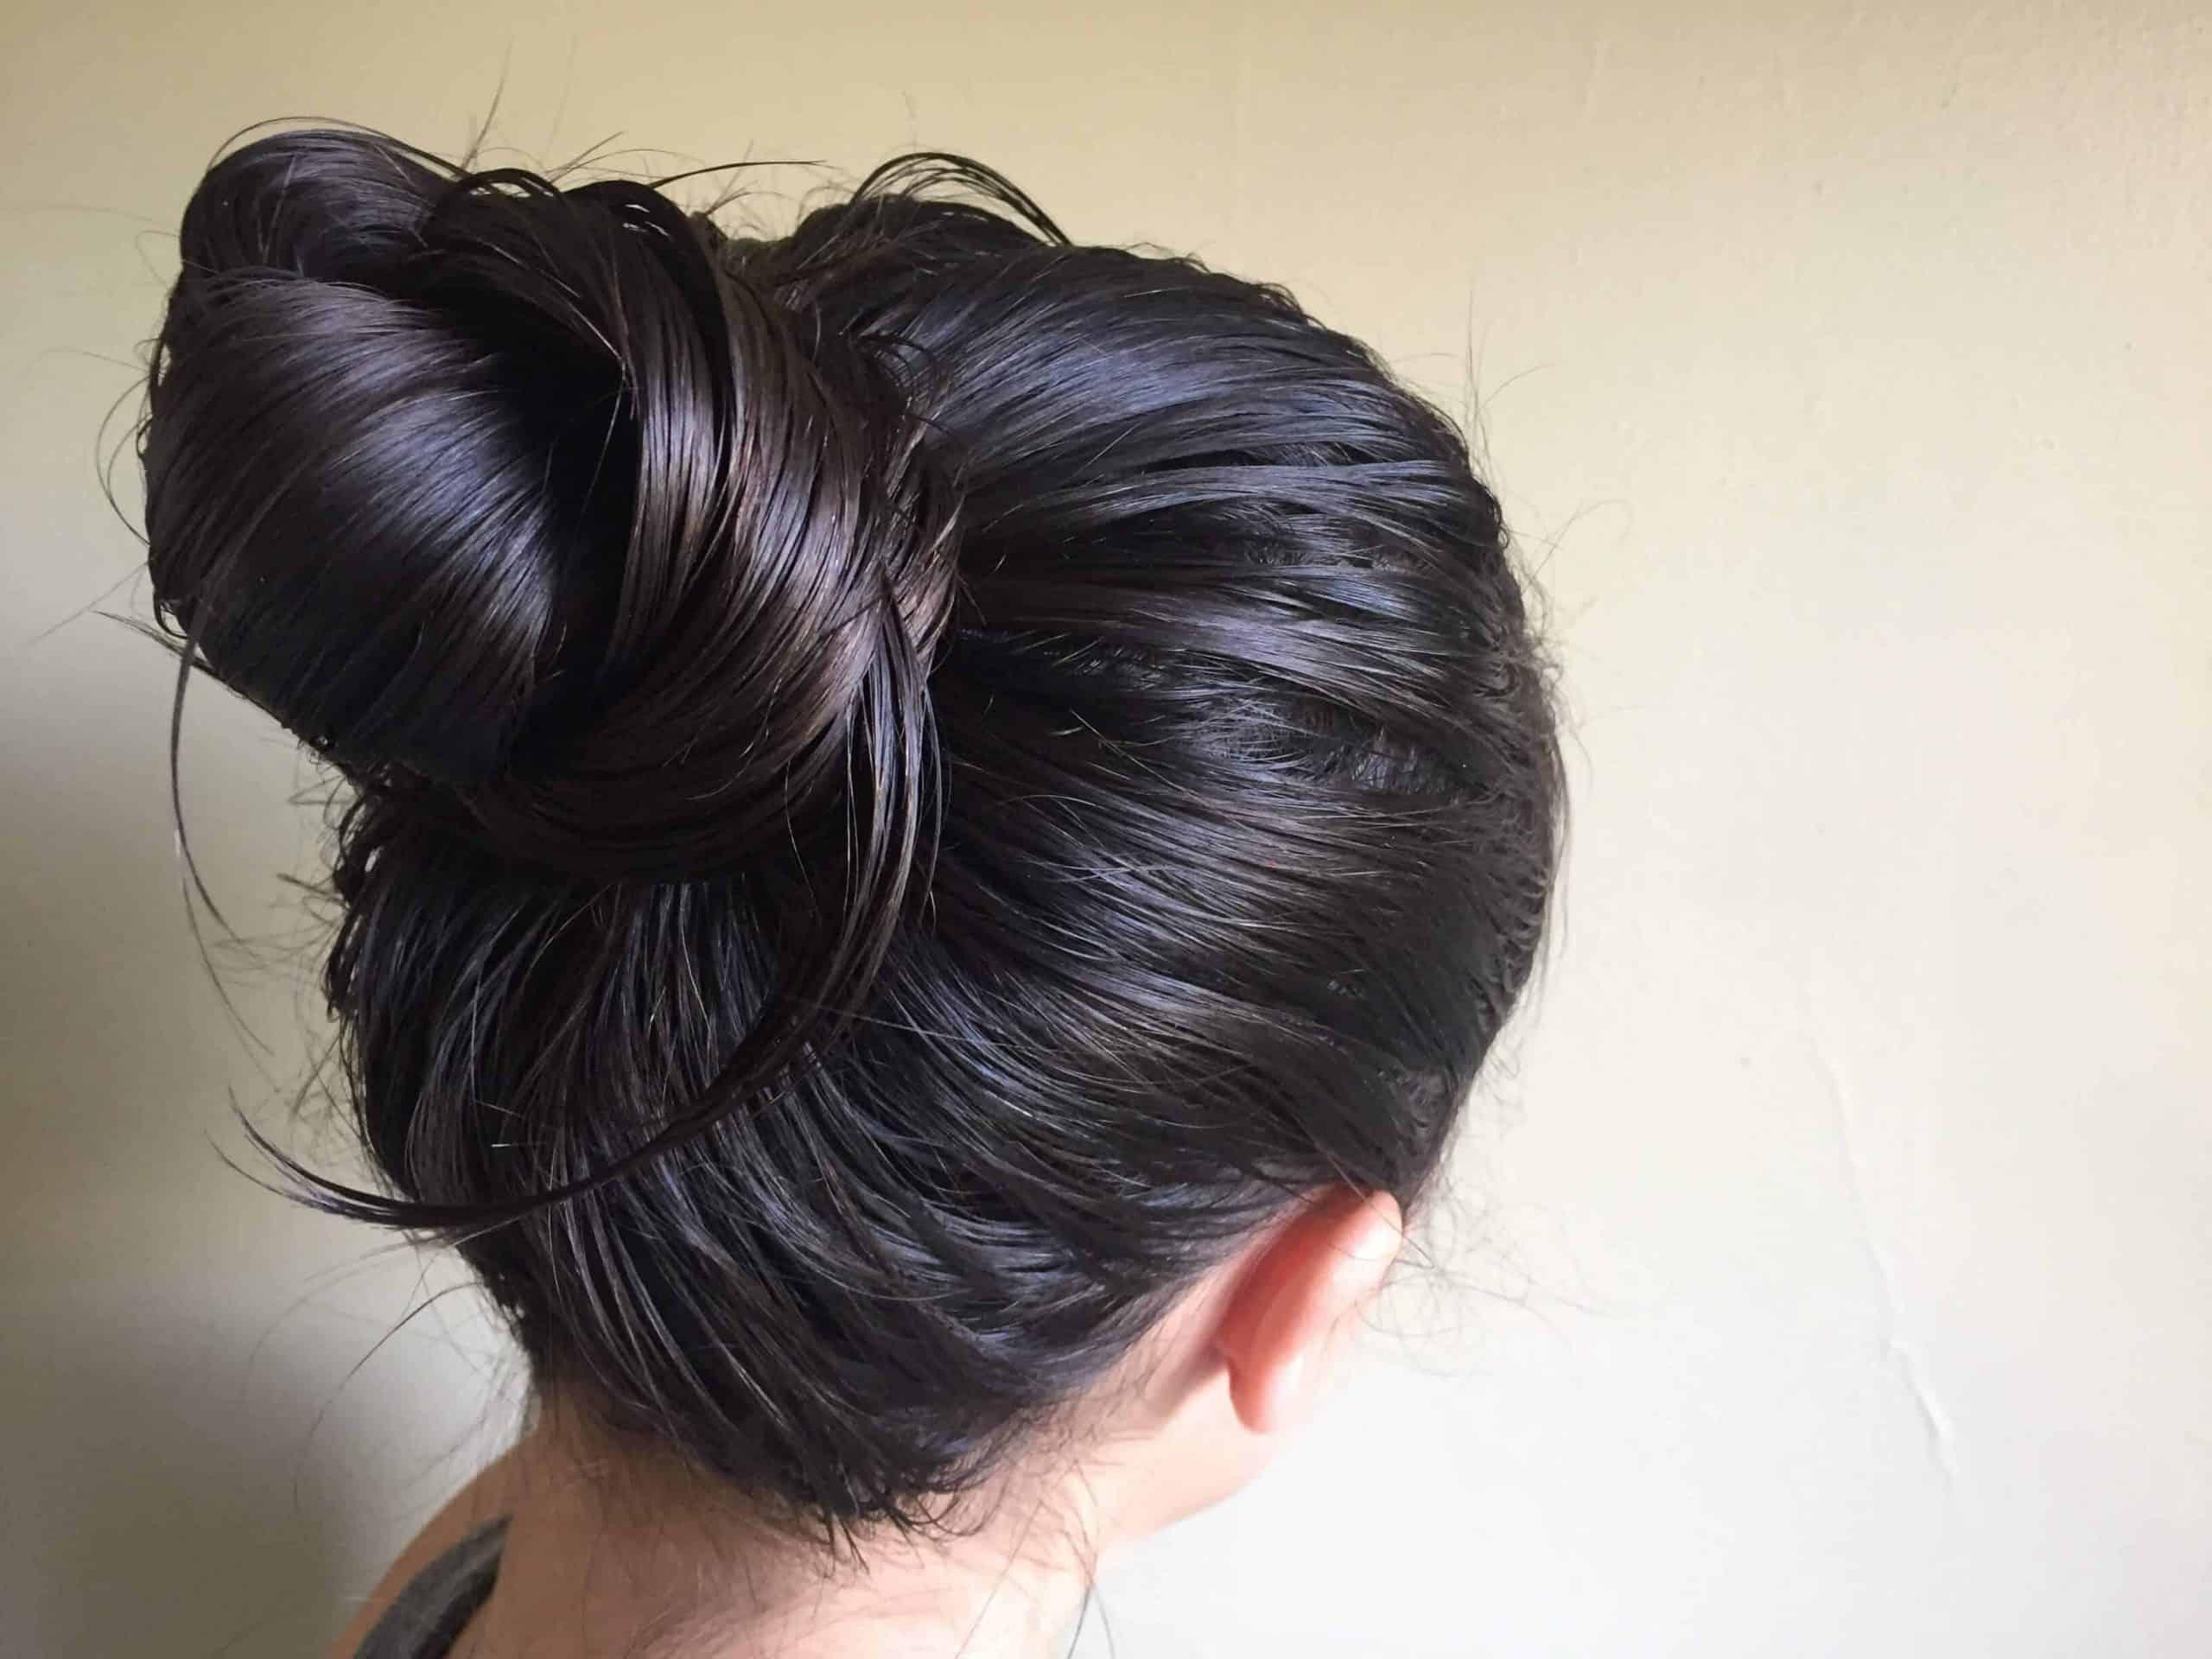 Non-Toxic Beauty Products & DIY Hair Treatment